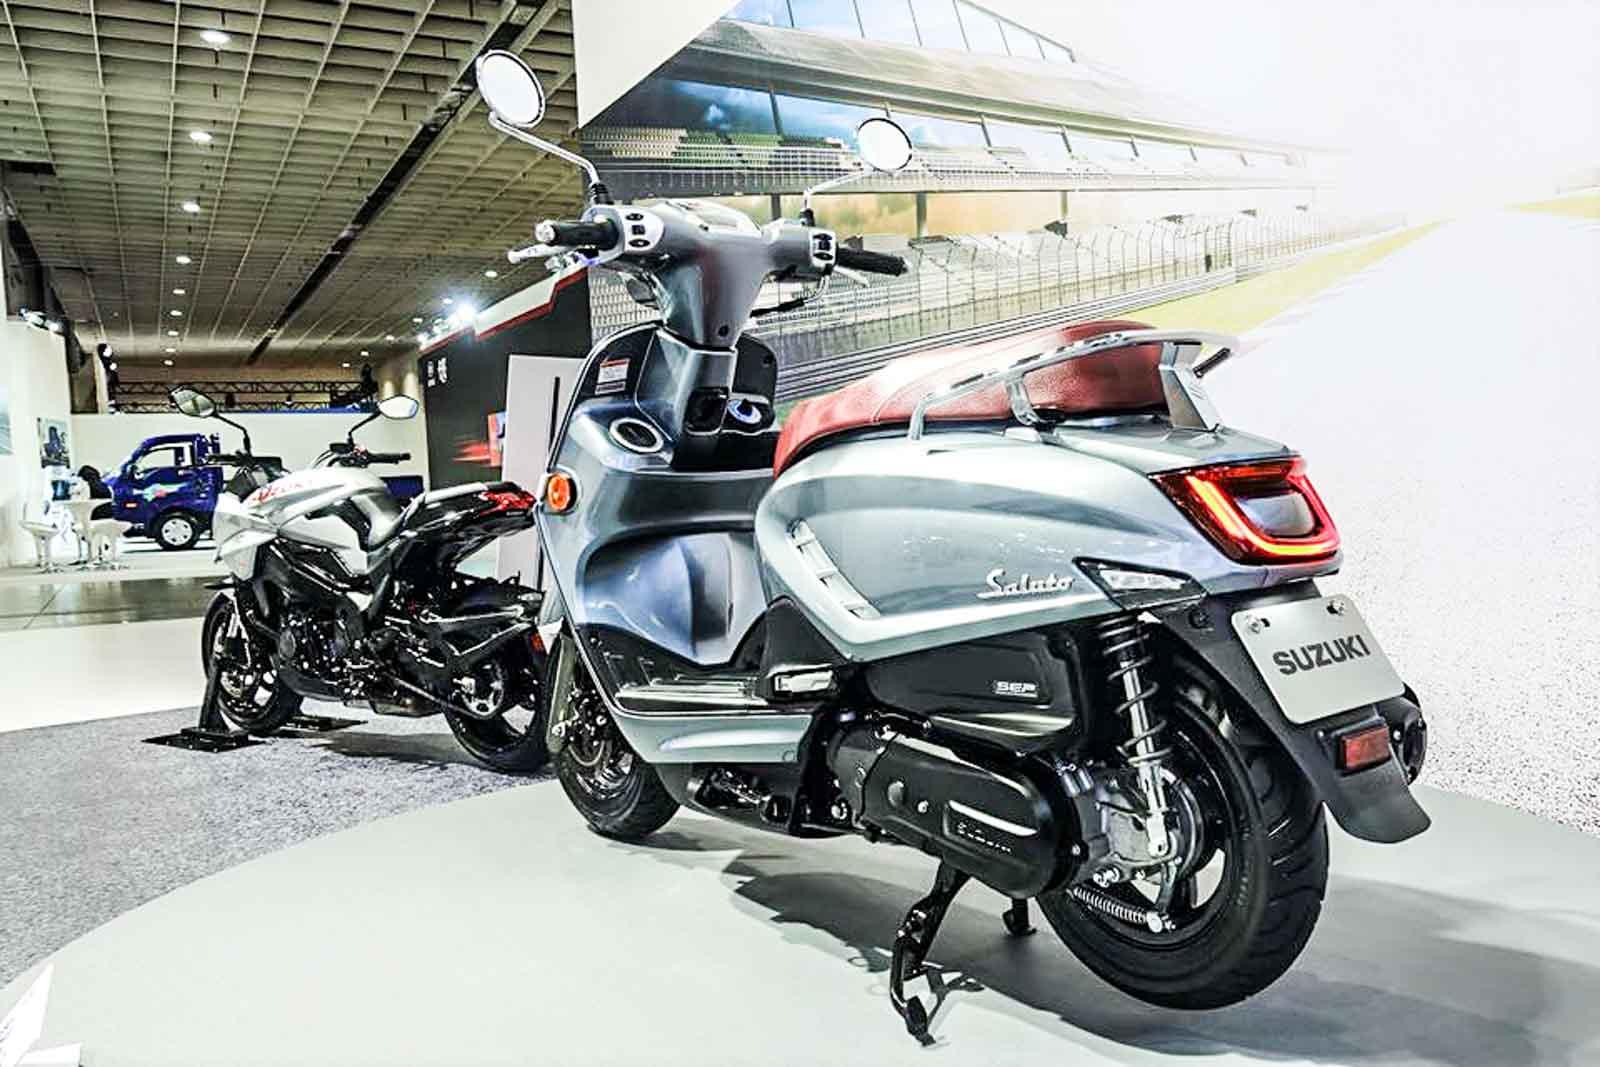 Suzuki Saluto scooter